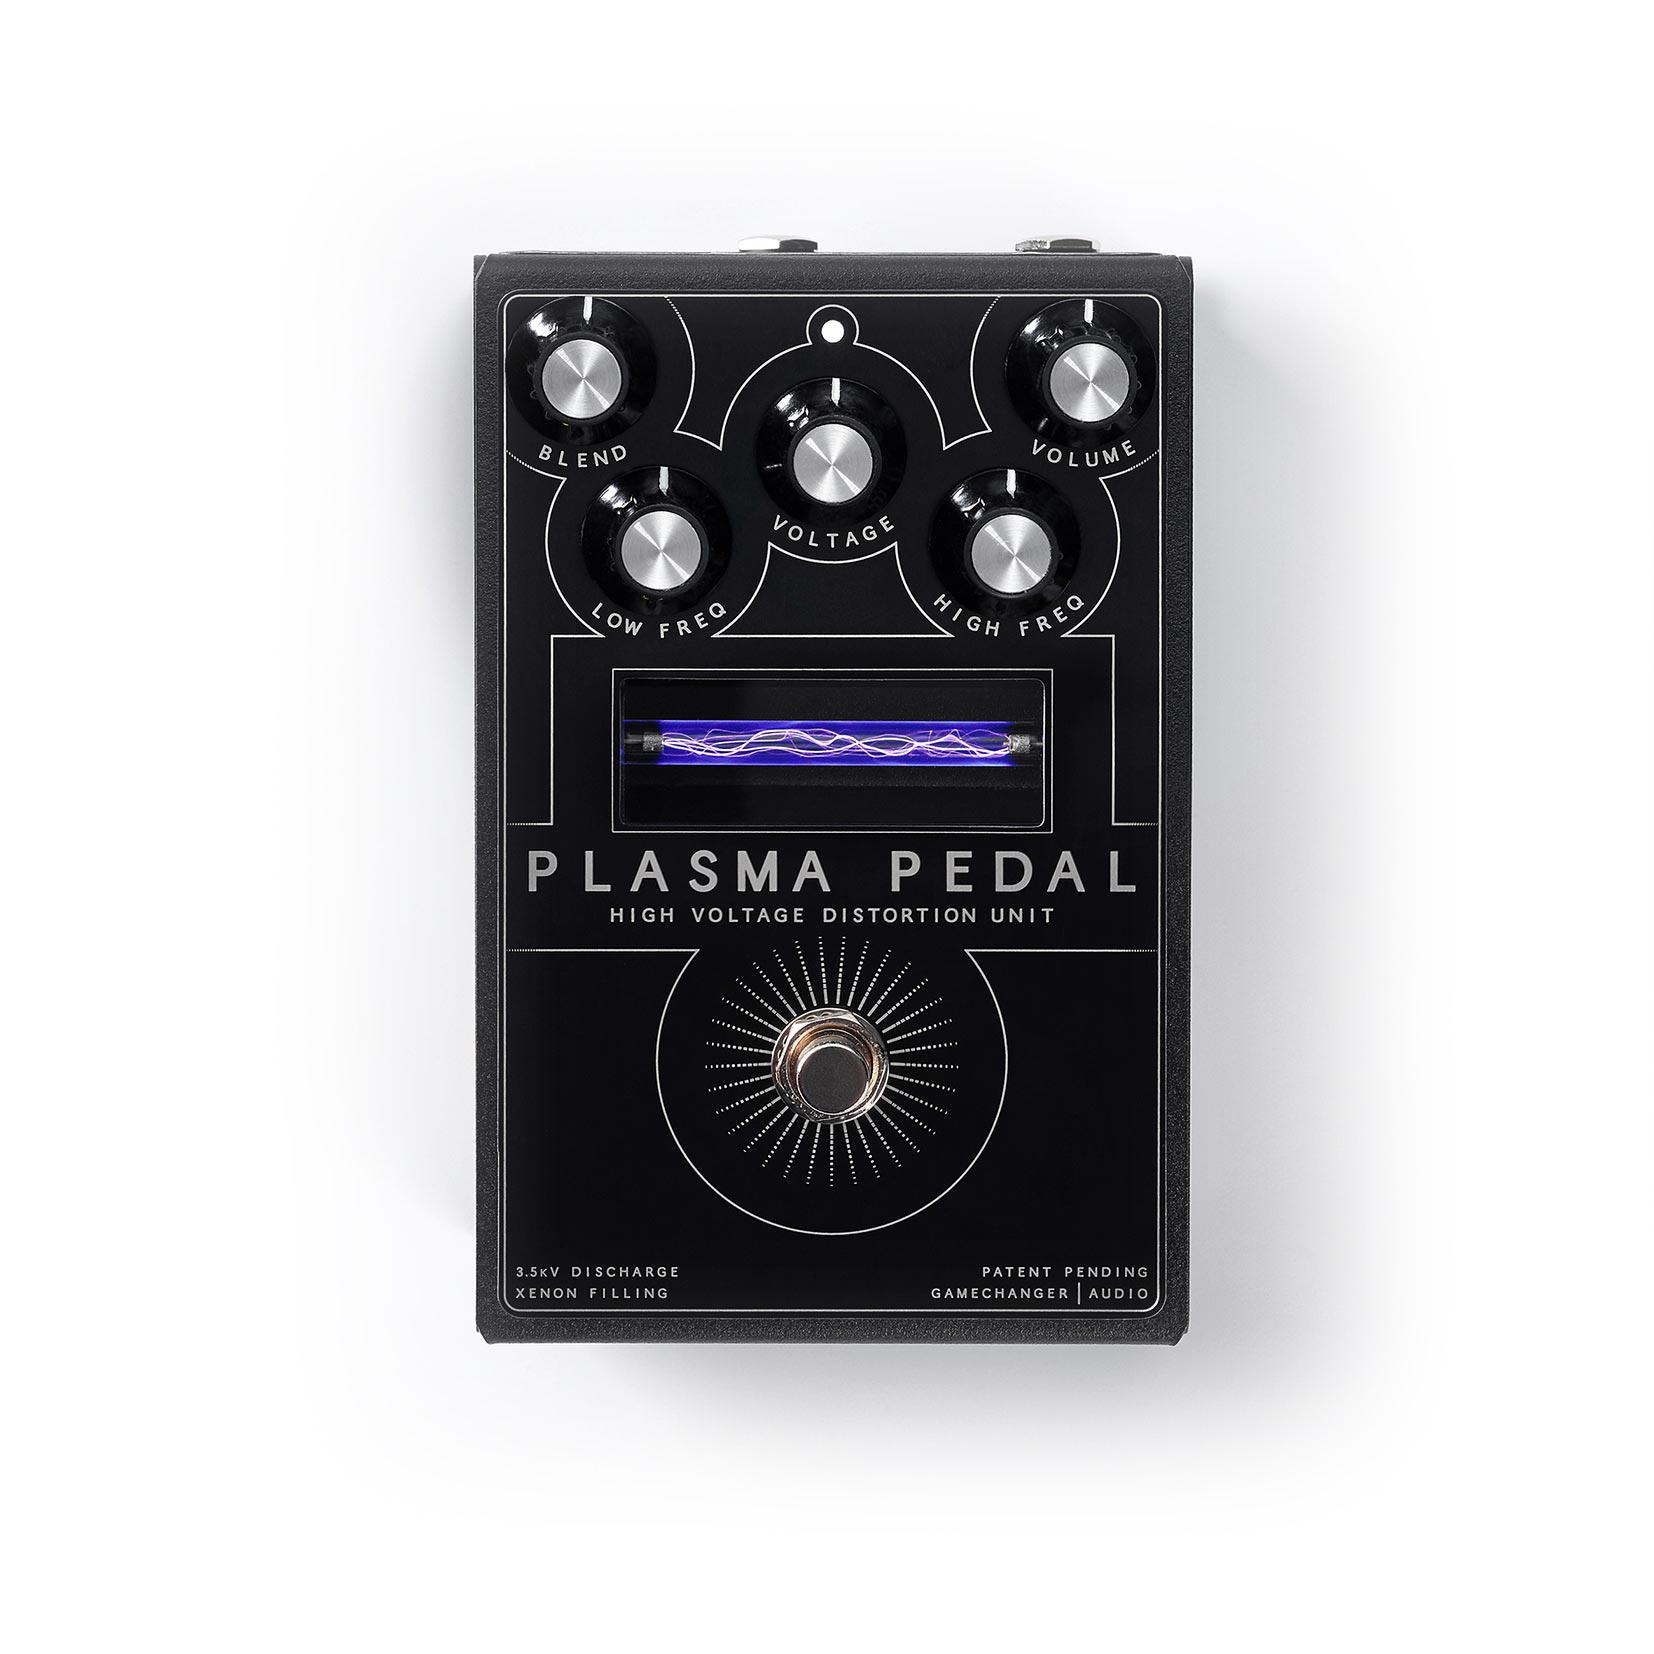 plasma pedal gamechanger audio rh gamechangeraudio com